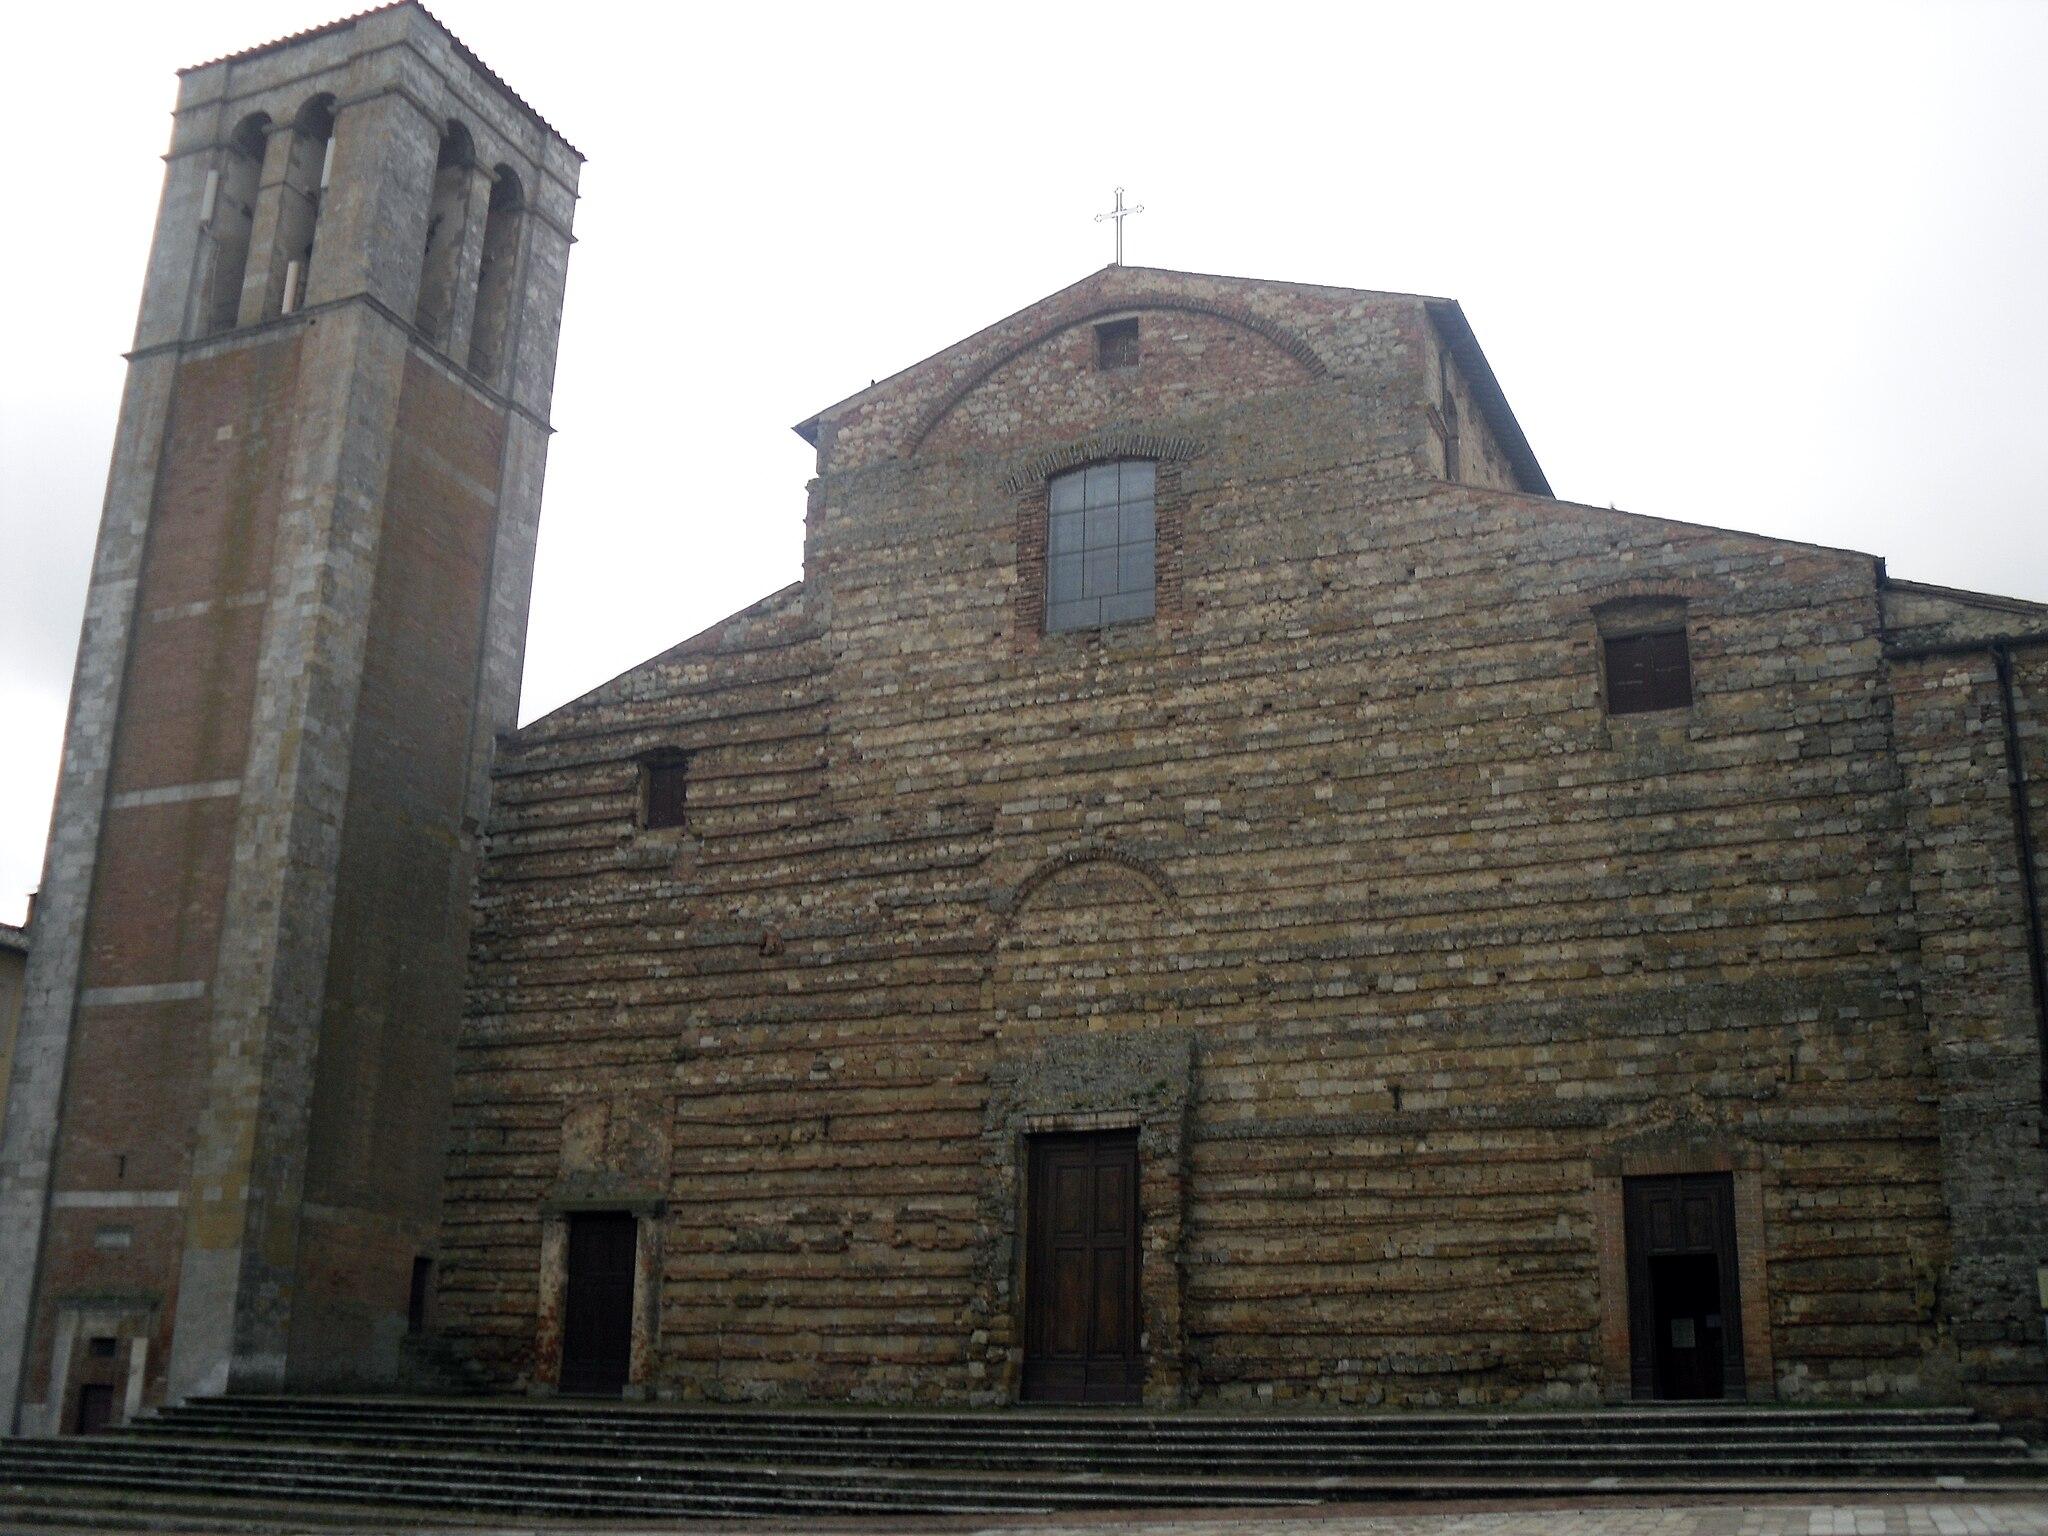 Duomo of Montepulciano, facade - 1